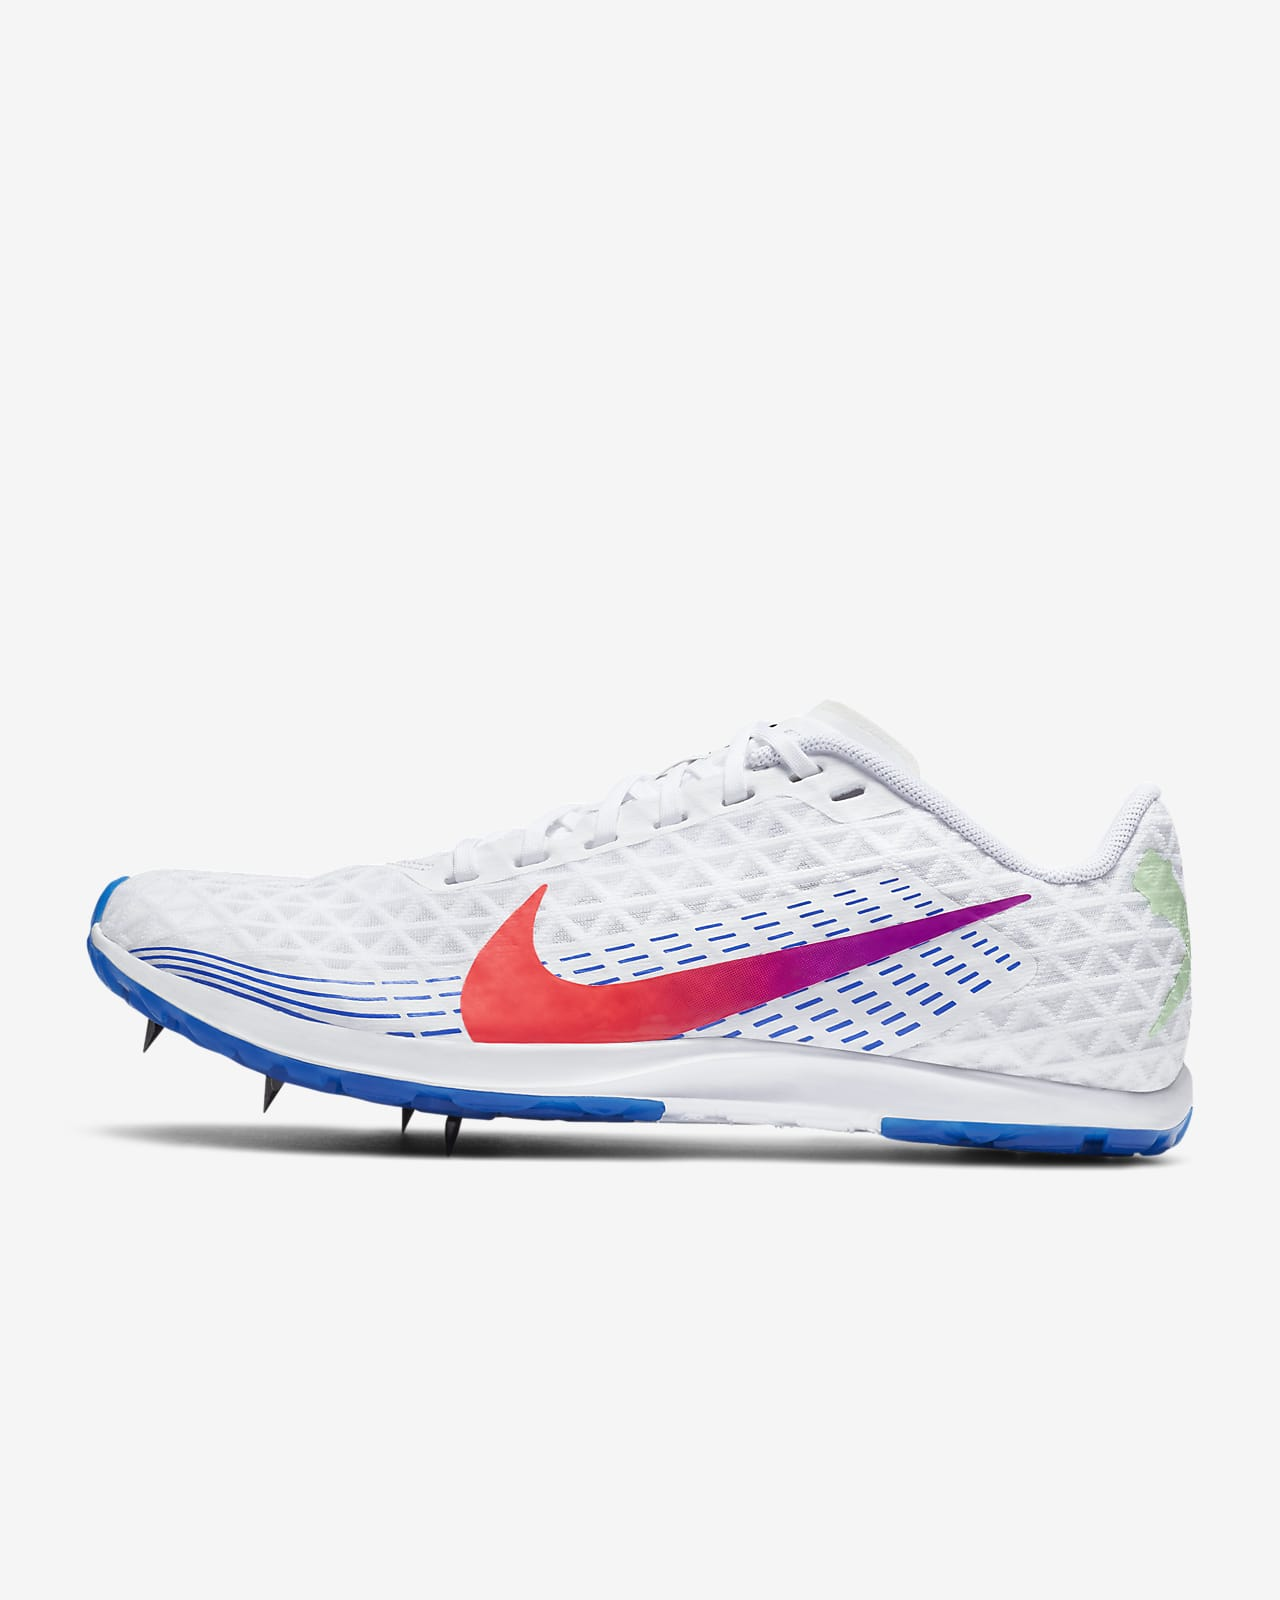 Nike Zoom Rival XC-banepigsko til kvinder